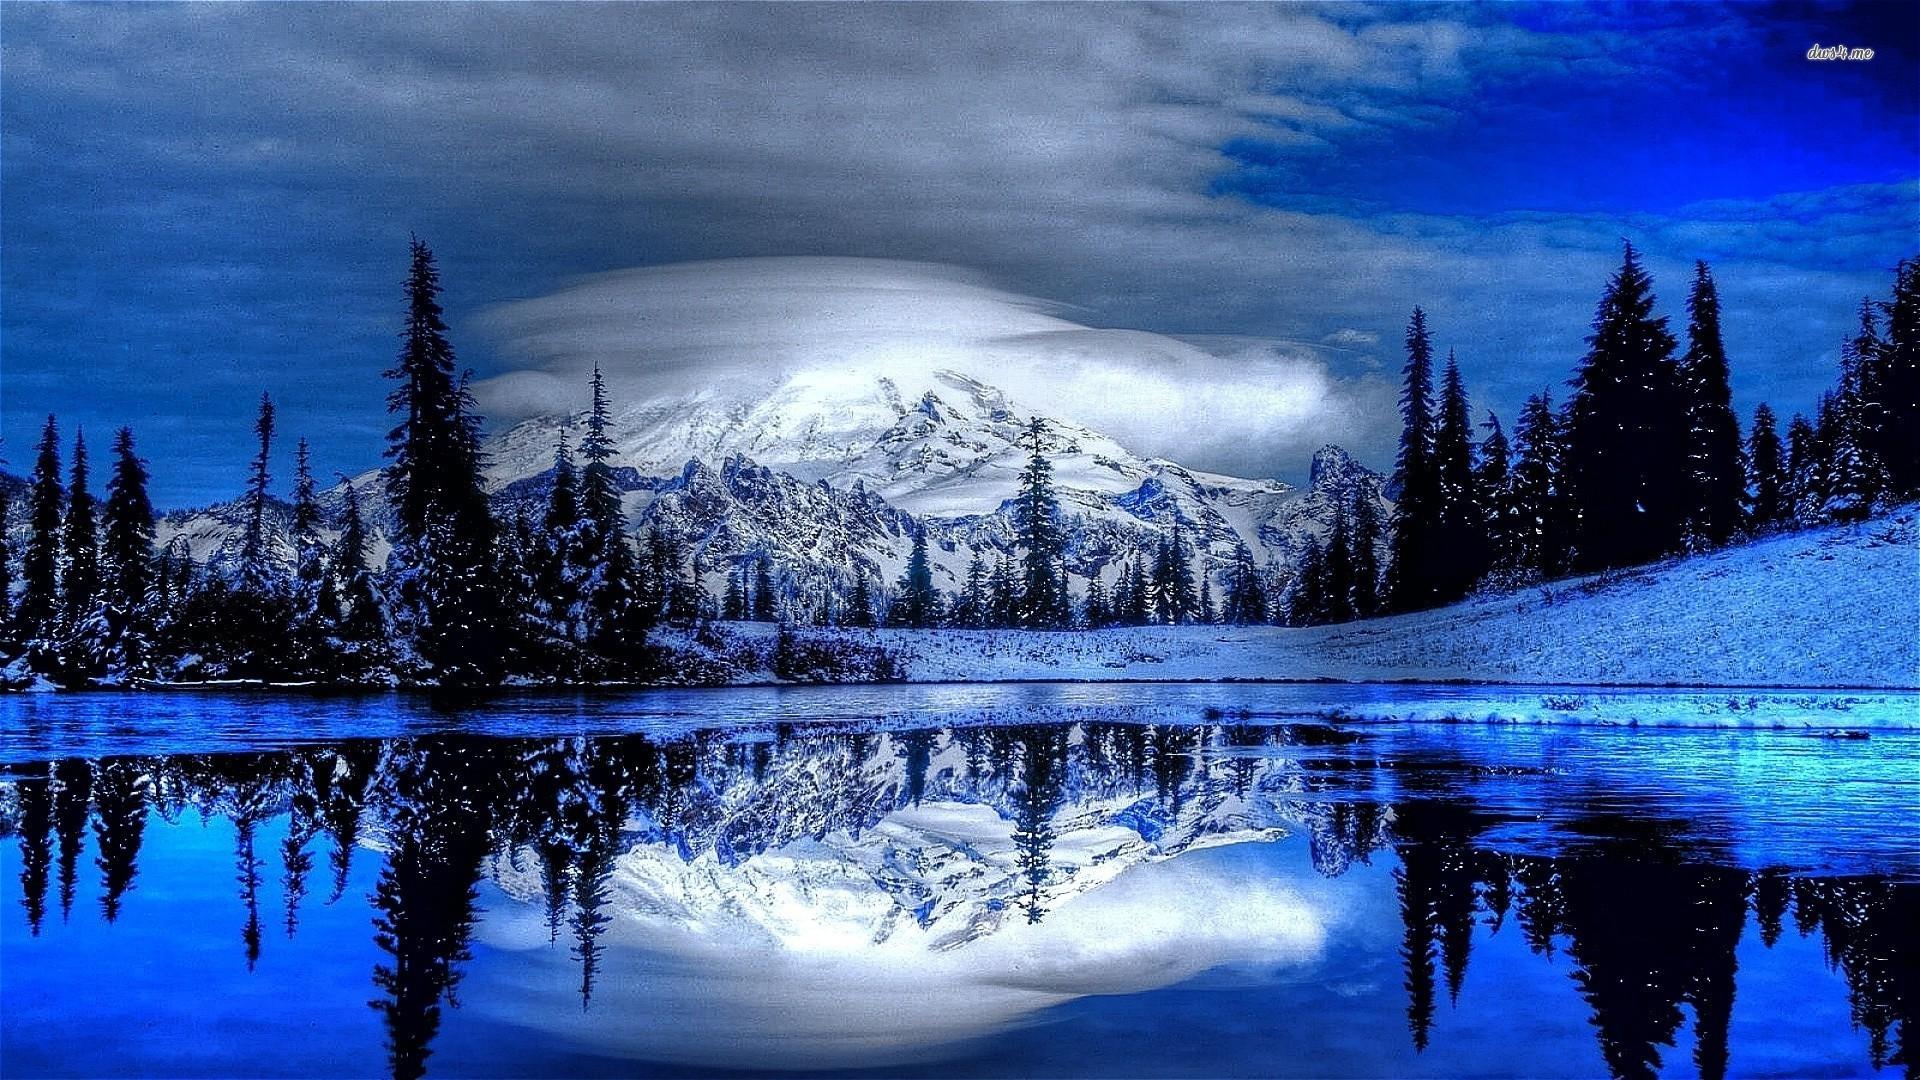 Winter mountain scenes wallpaper 43 images - Mountain screensavers free ...